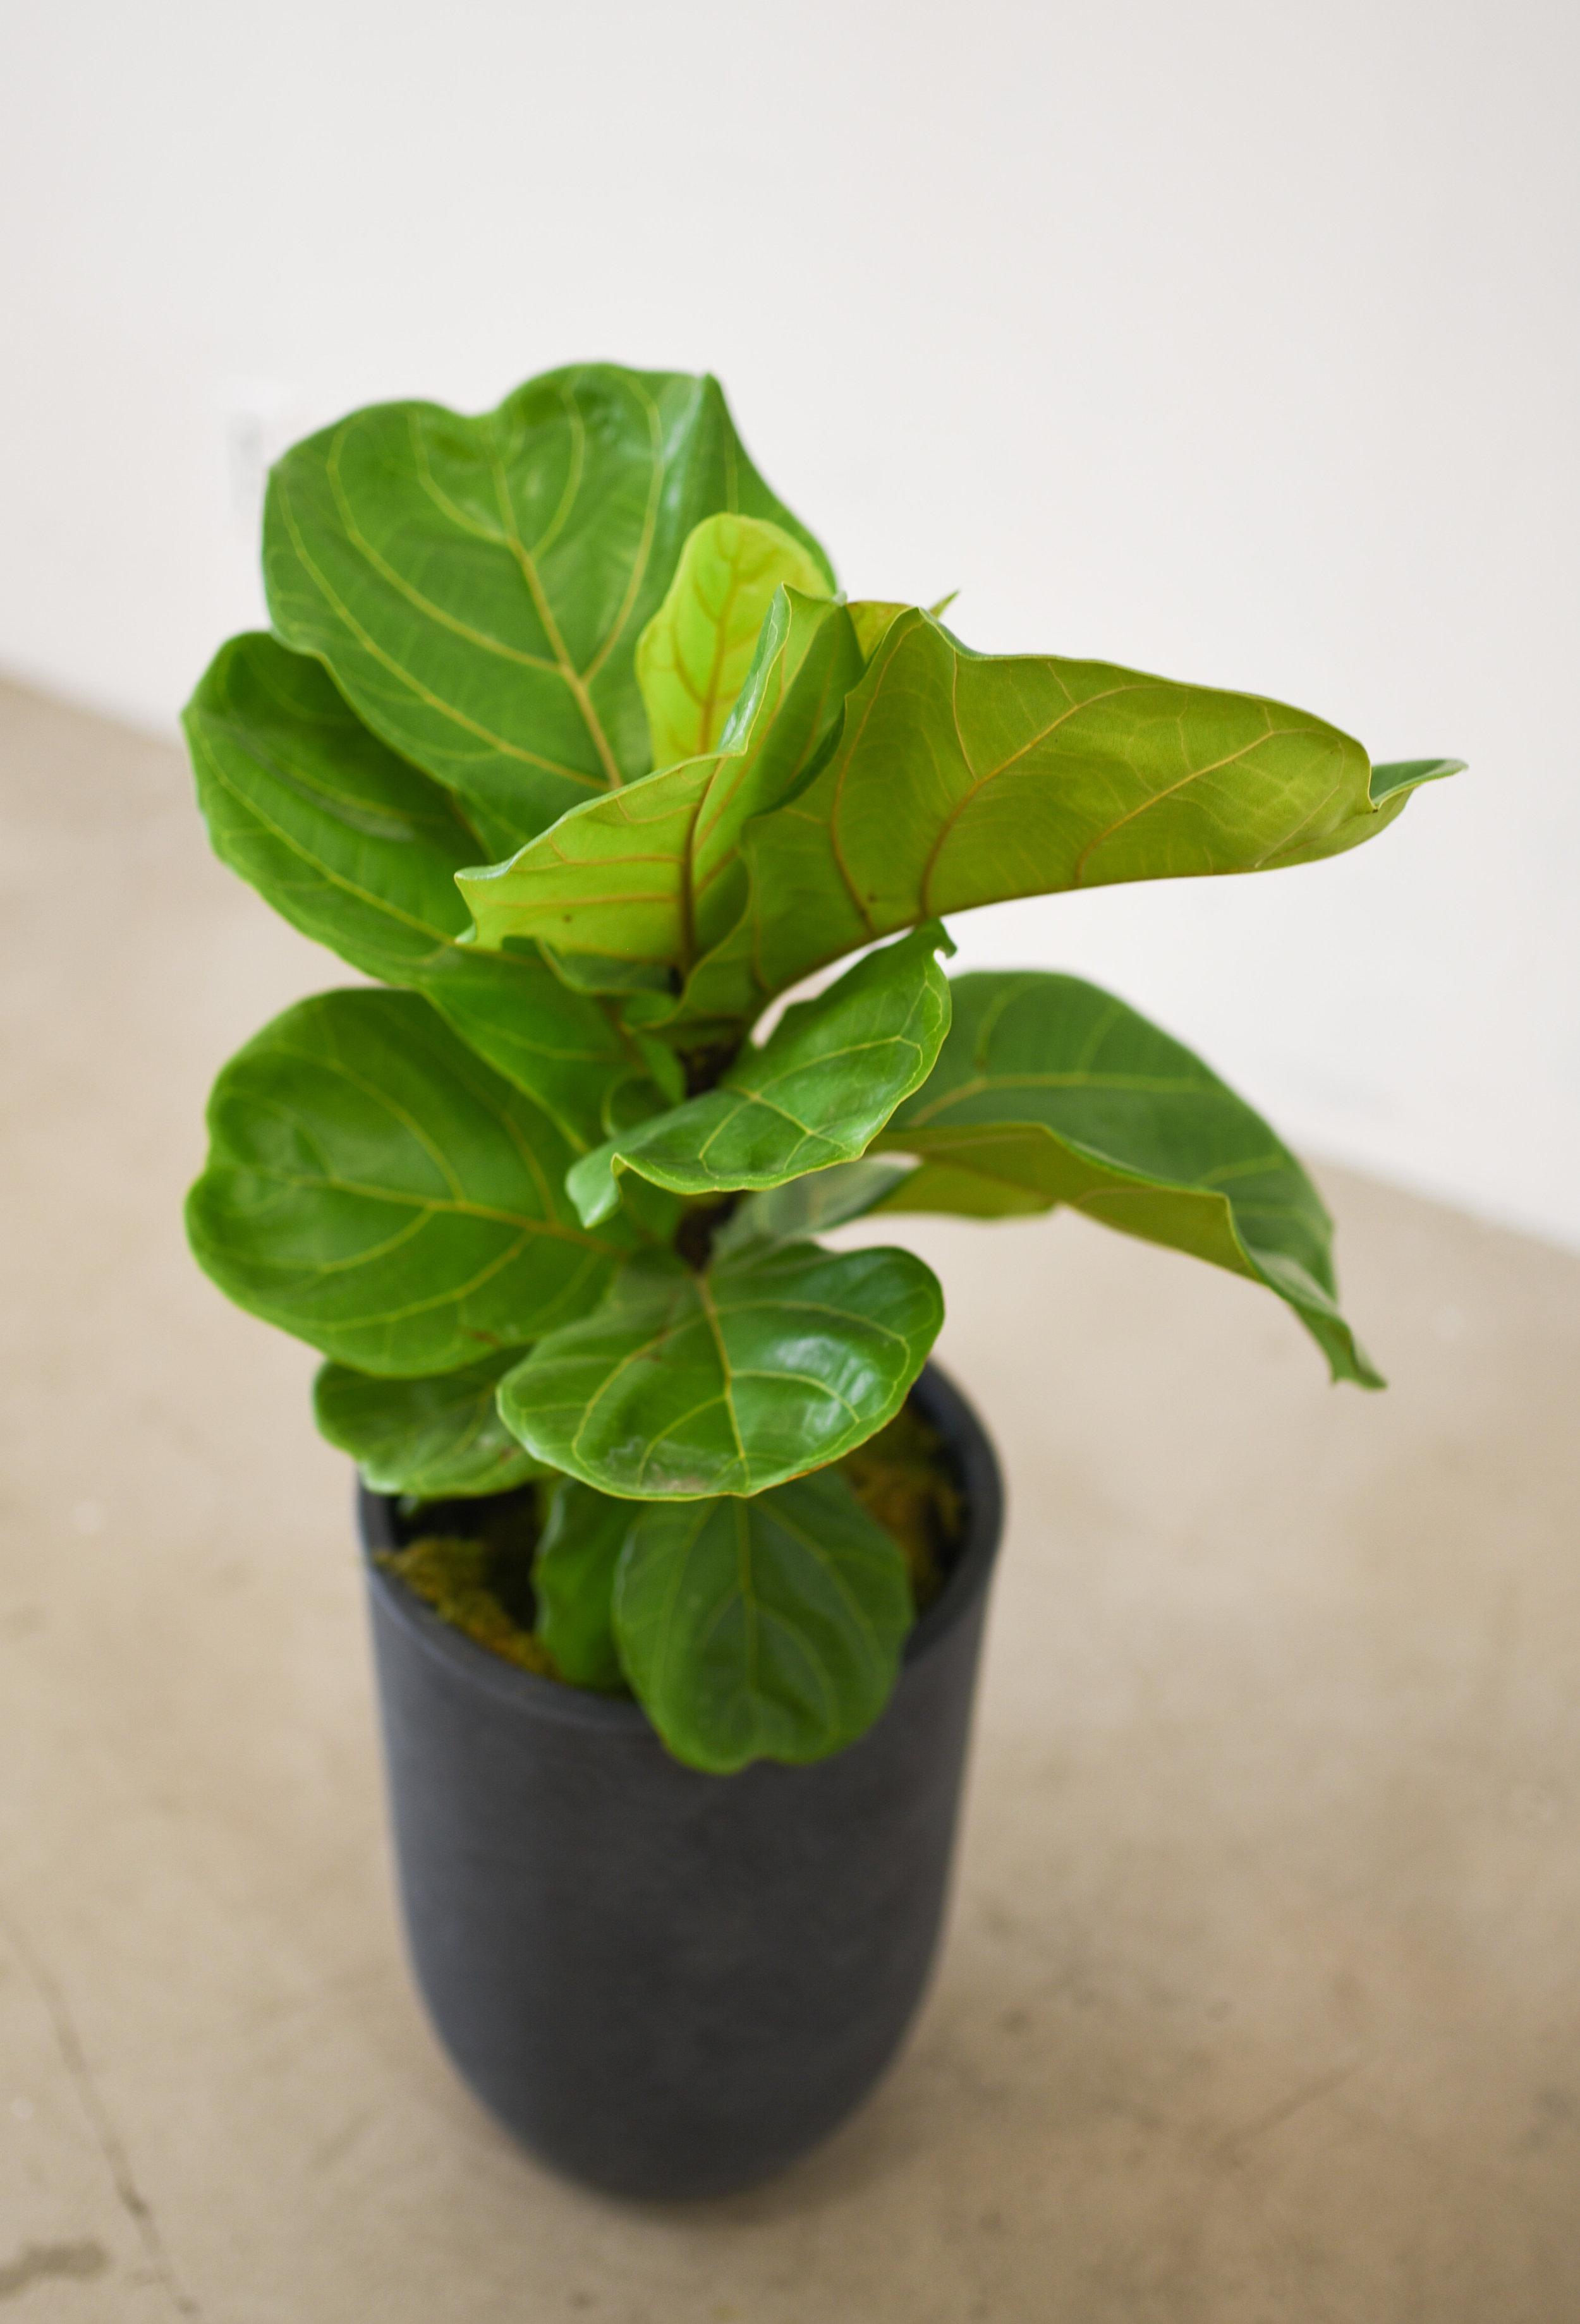 A baby Ficus Lyrata